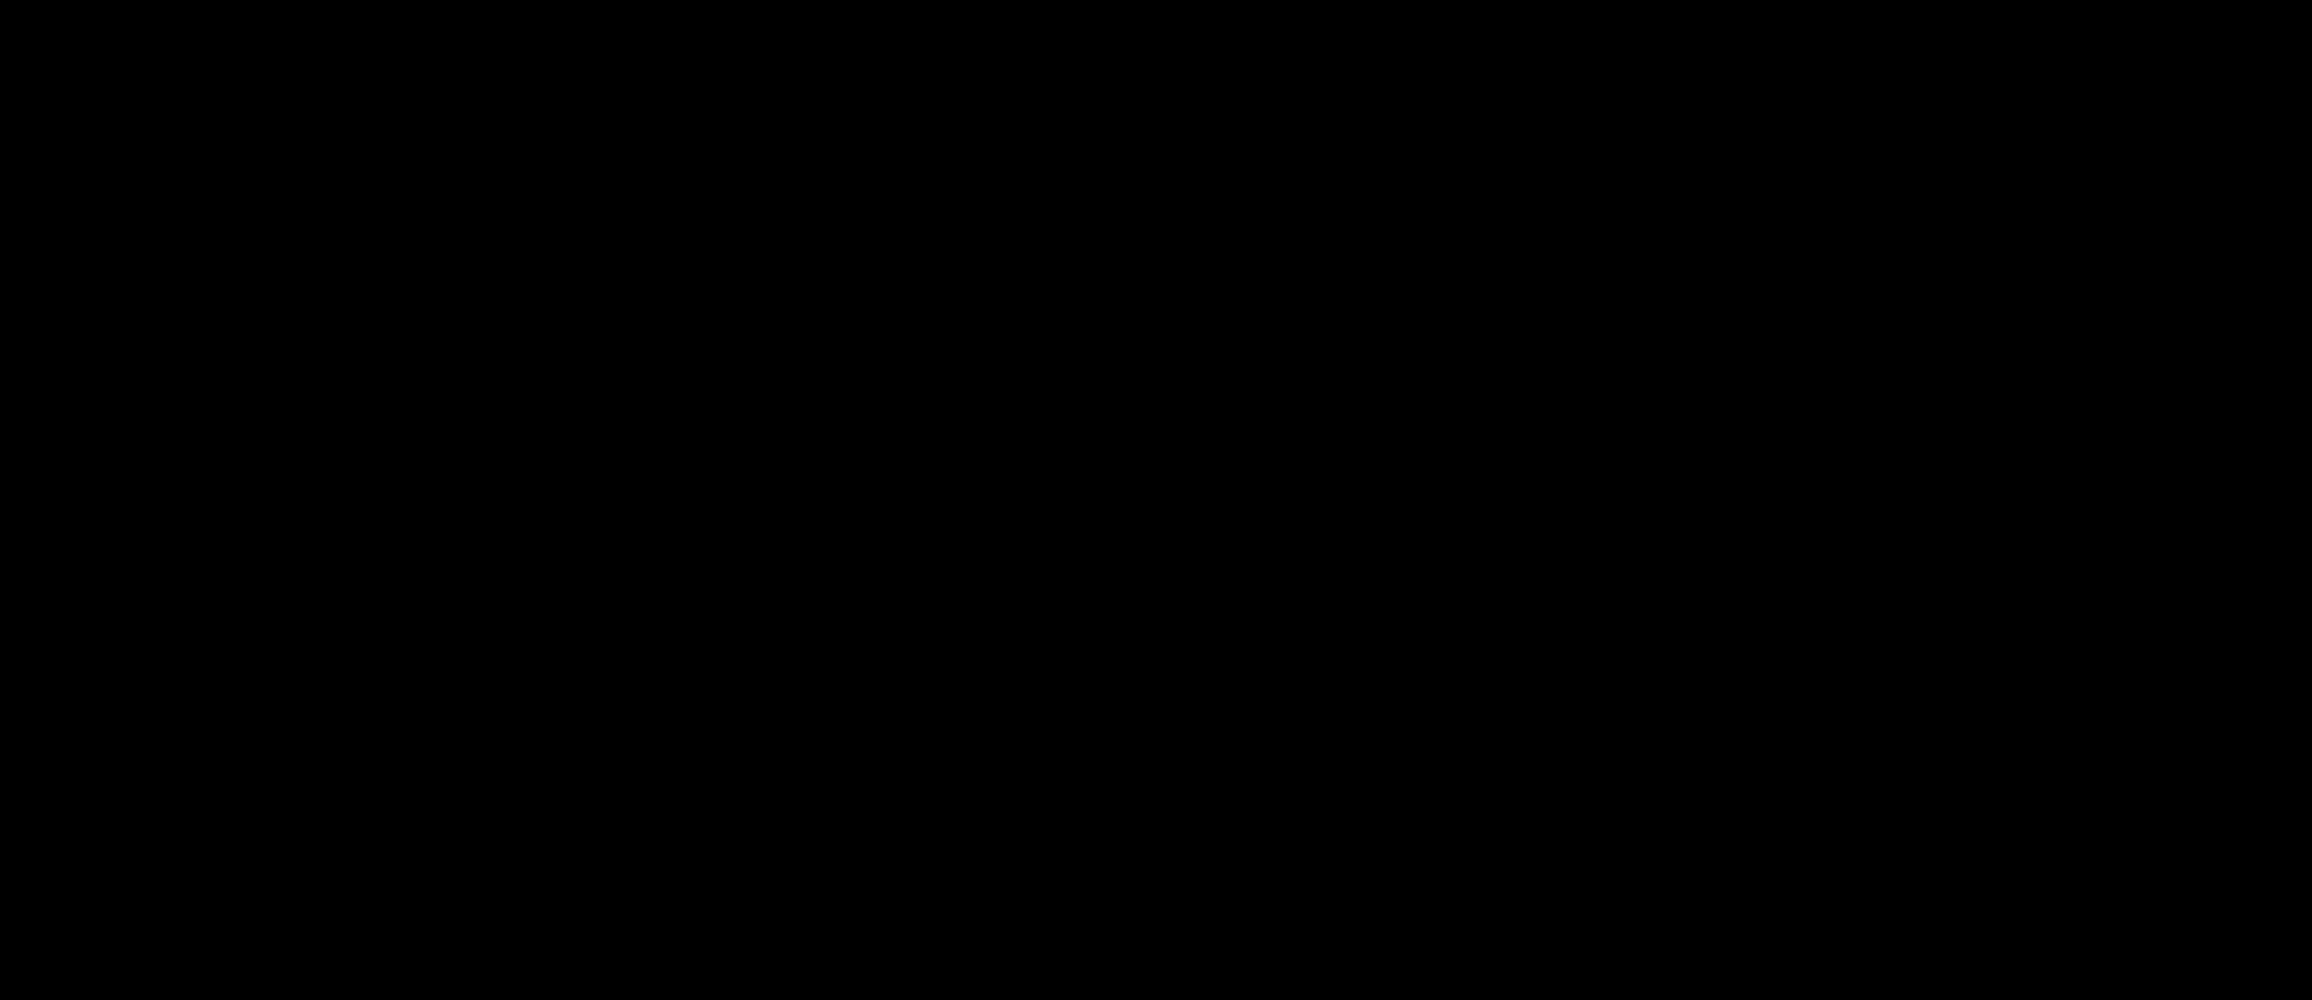 BILETHEKIDS-tipografias-logo